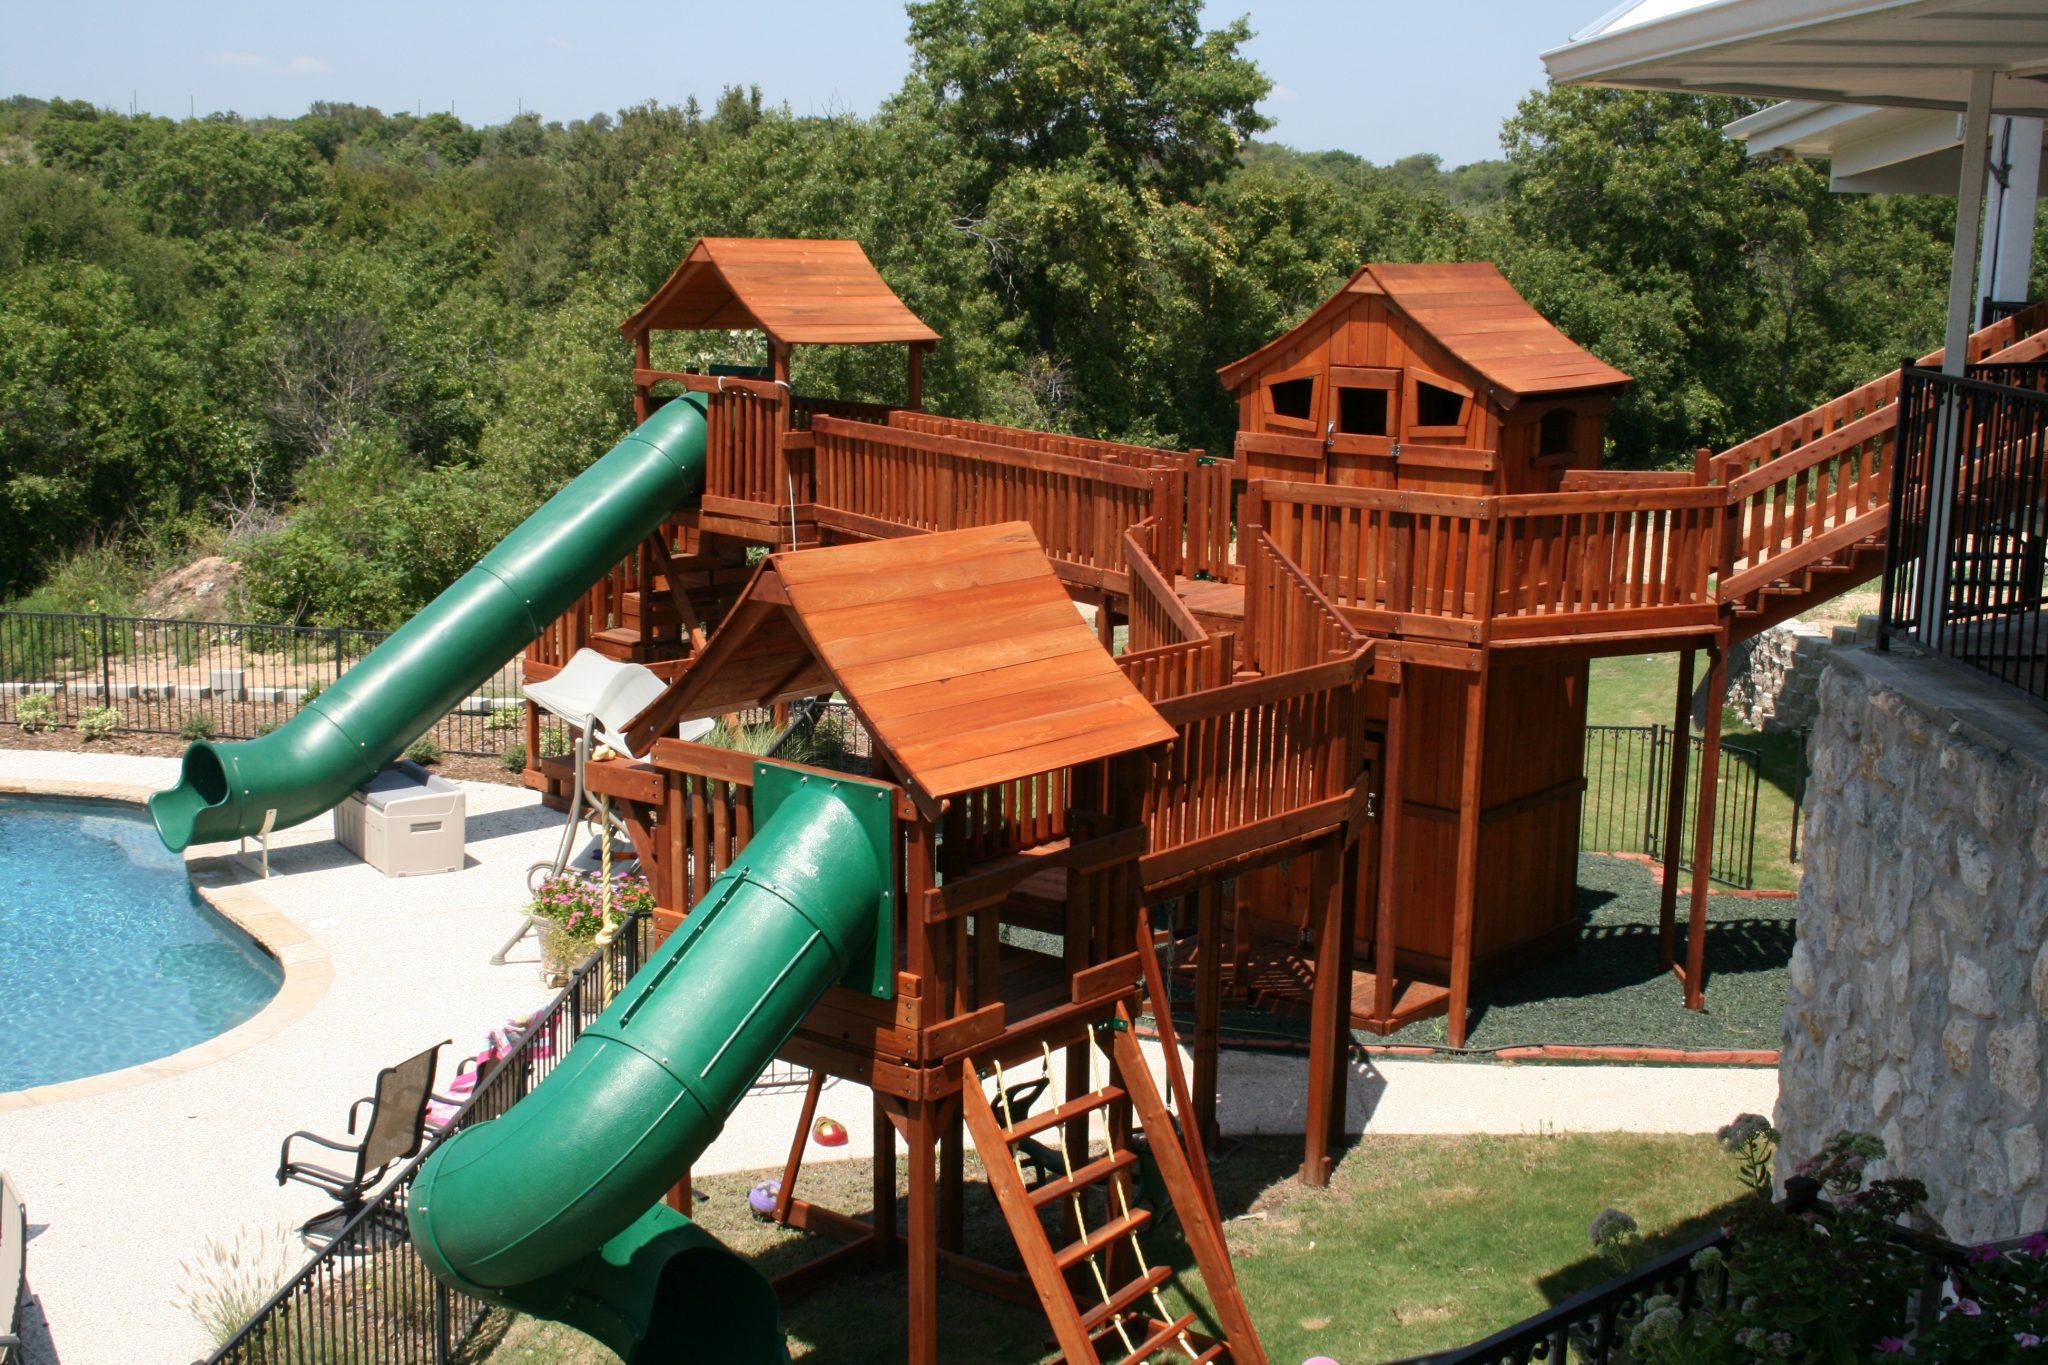 custom playground custom backyard swing set custom wooden swing set